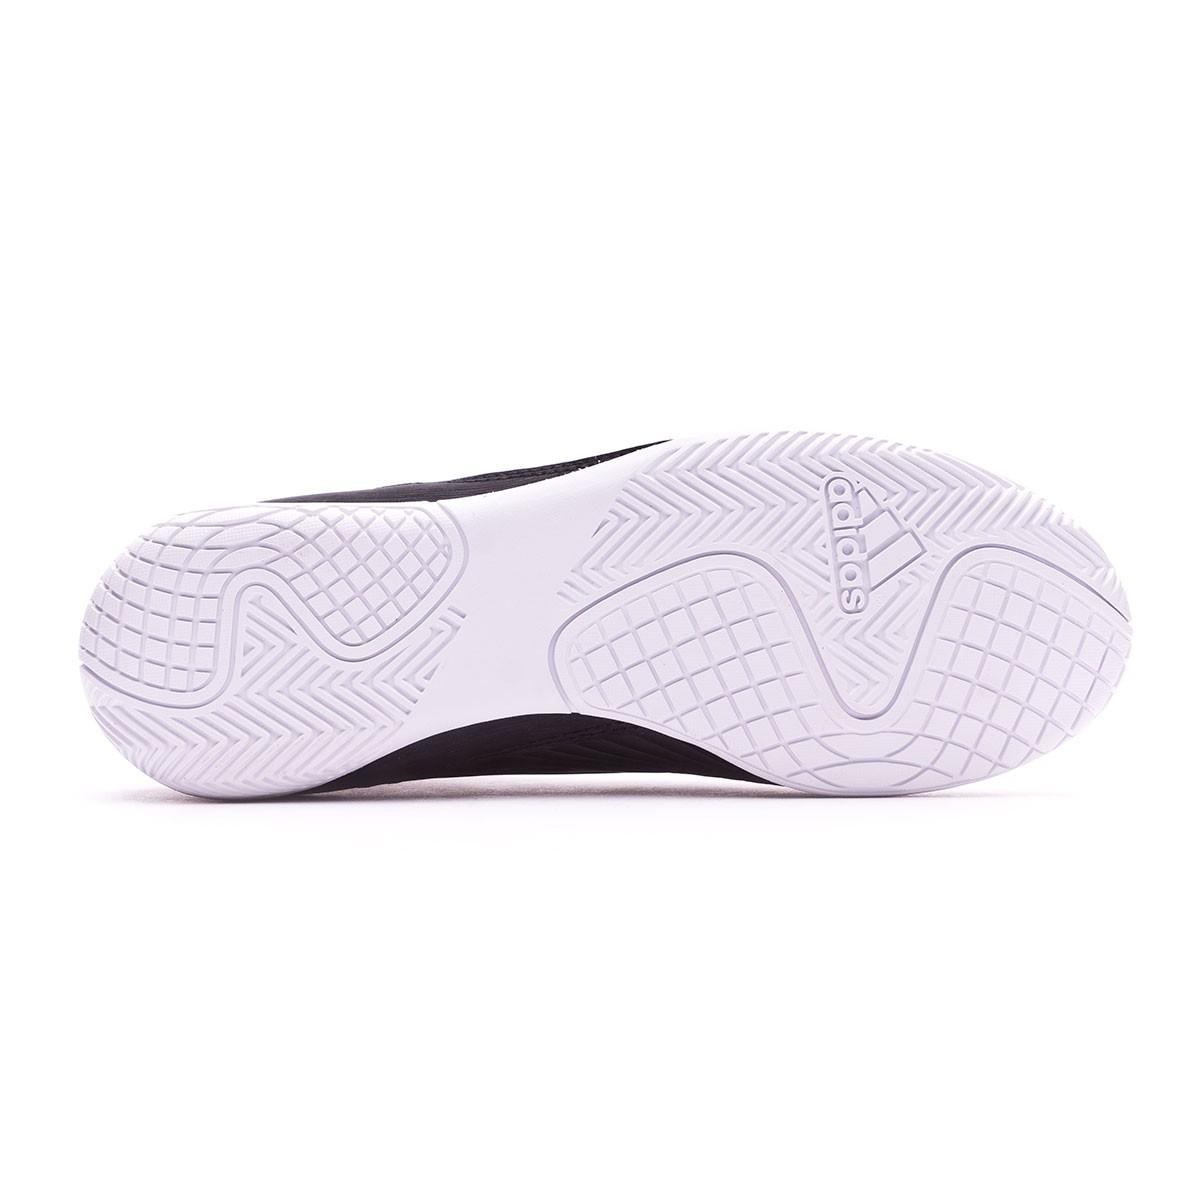 Chaussure de futsal adidas Predator Tango 18.3 IN enfant